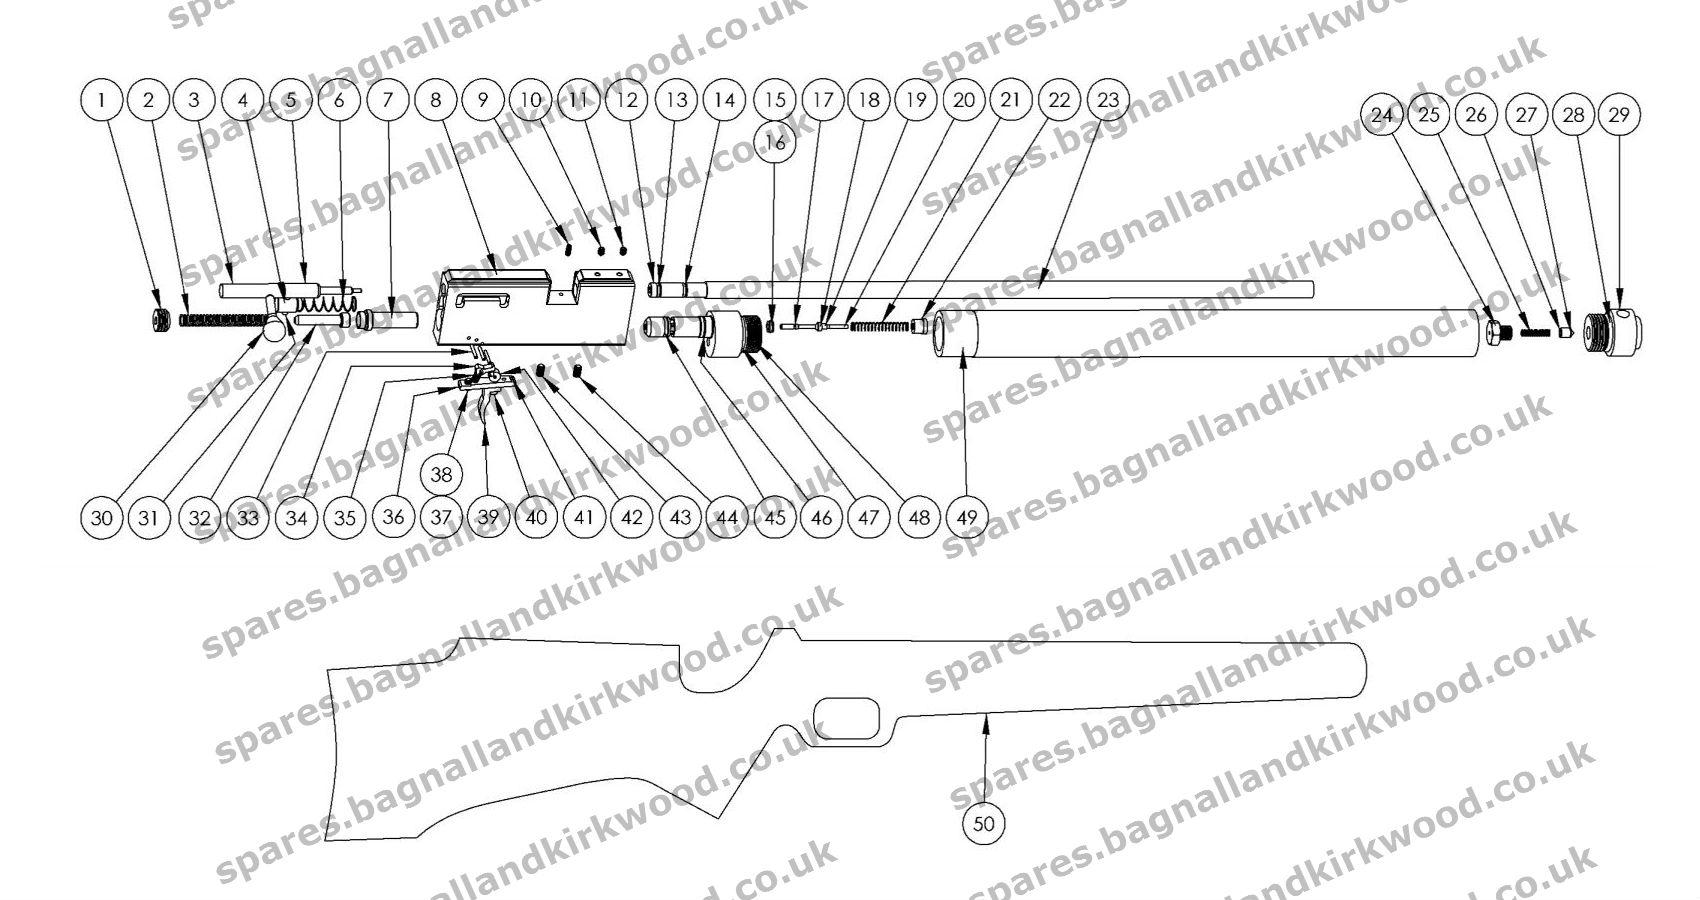 FX Typhoon / T1 - Bagnall and Kirkwood Airgun Spares